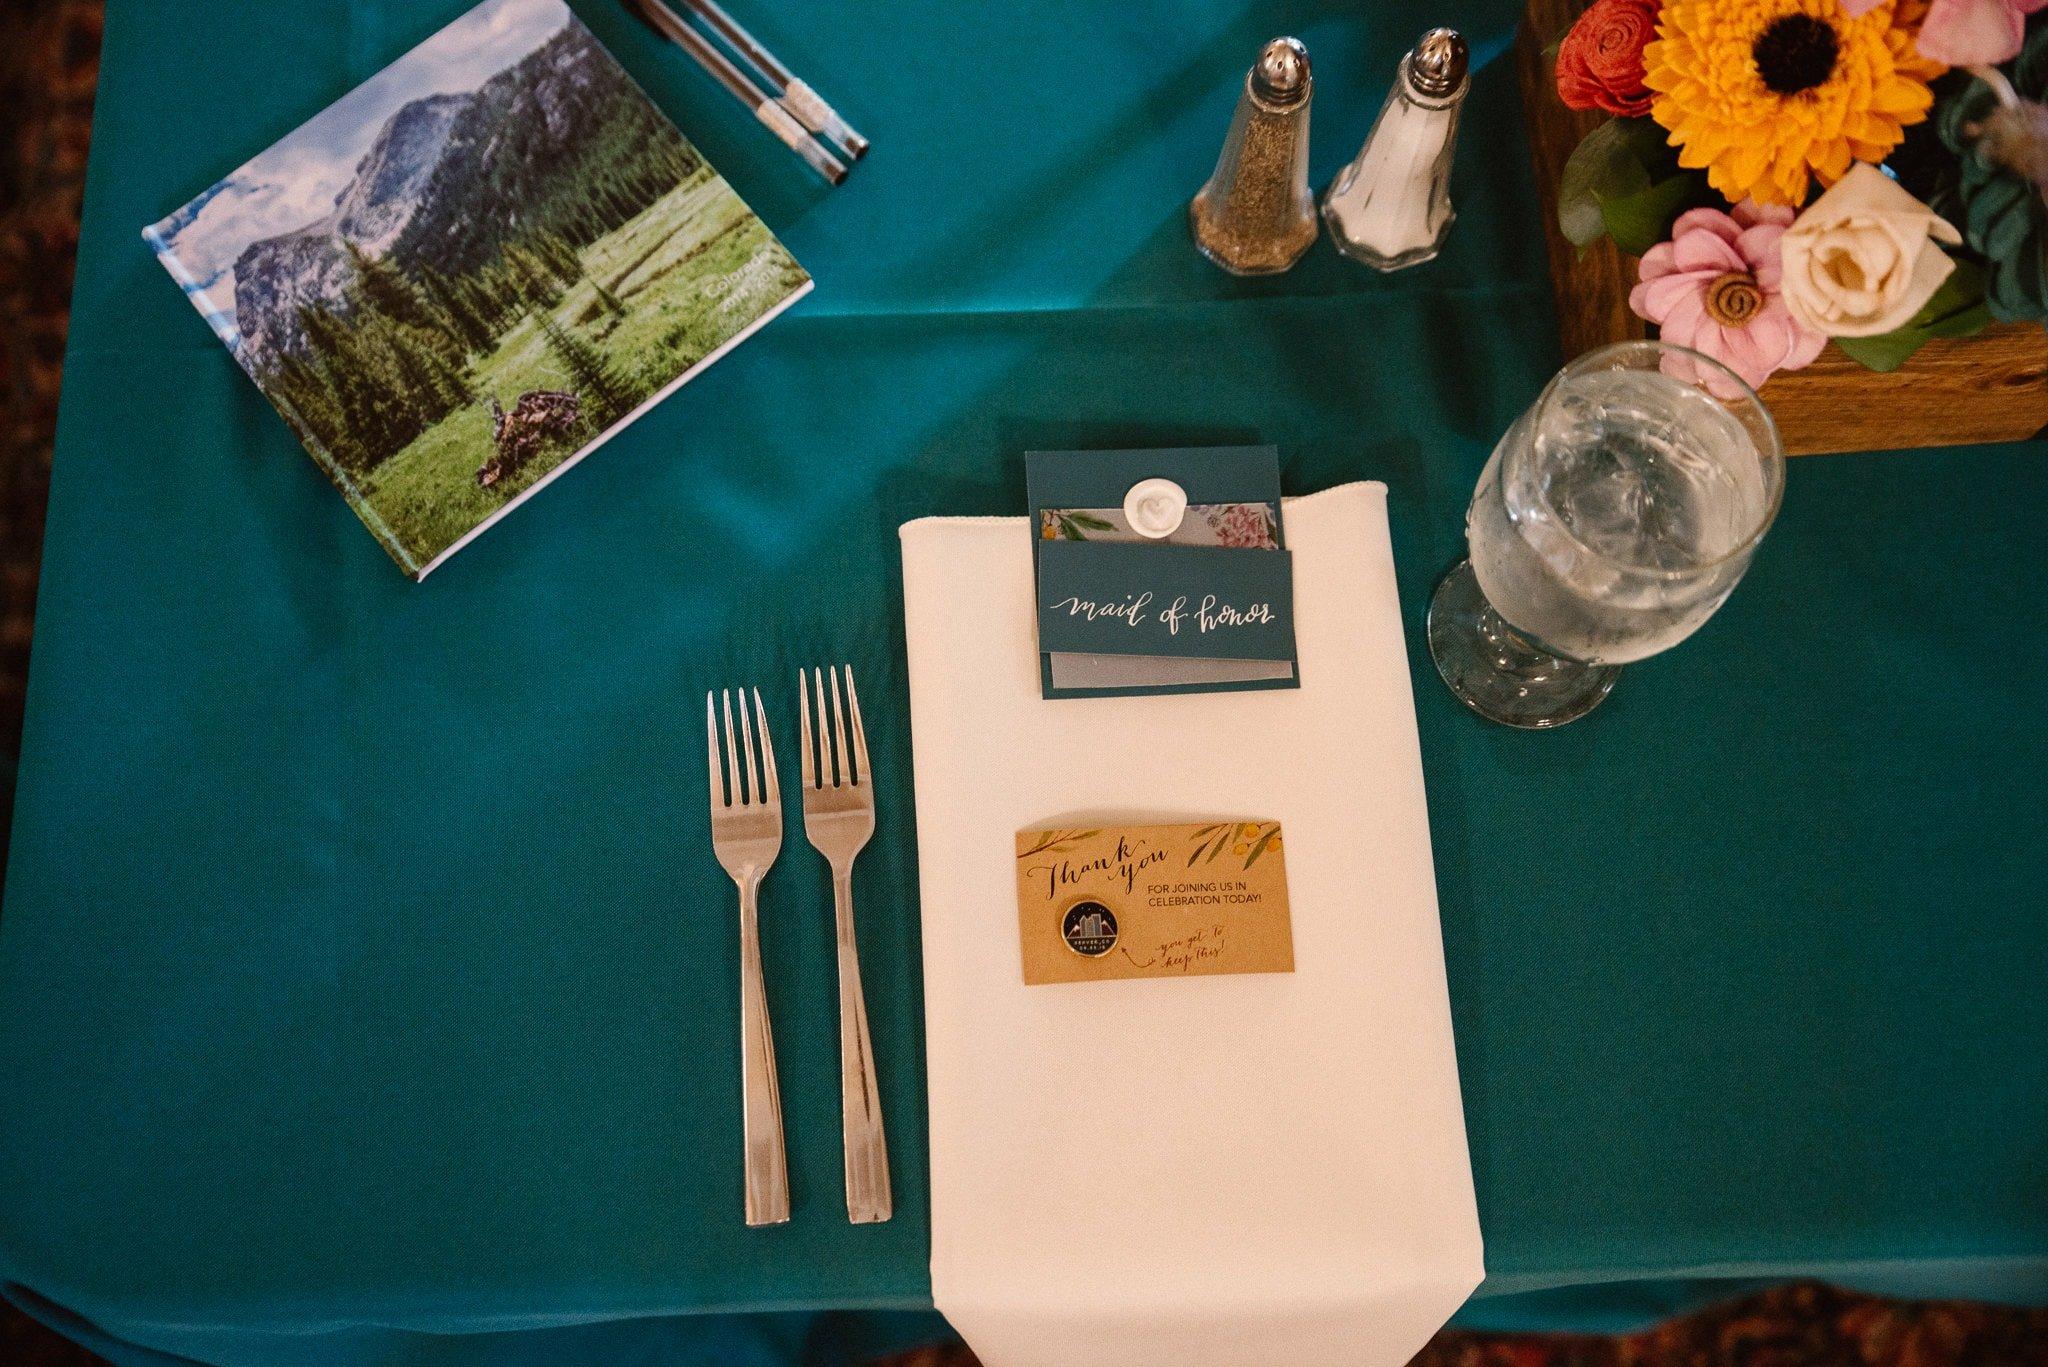 Grant Humphreys Mansion Wedding Photographer, Denver wedding photographer, Colorado wedding photographer, reception venue, wedding reception decor,